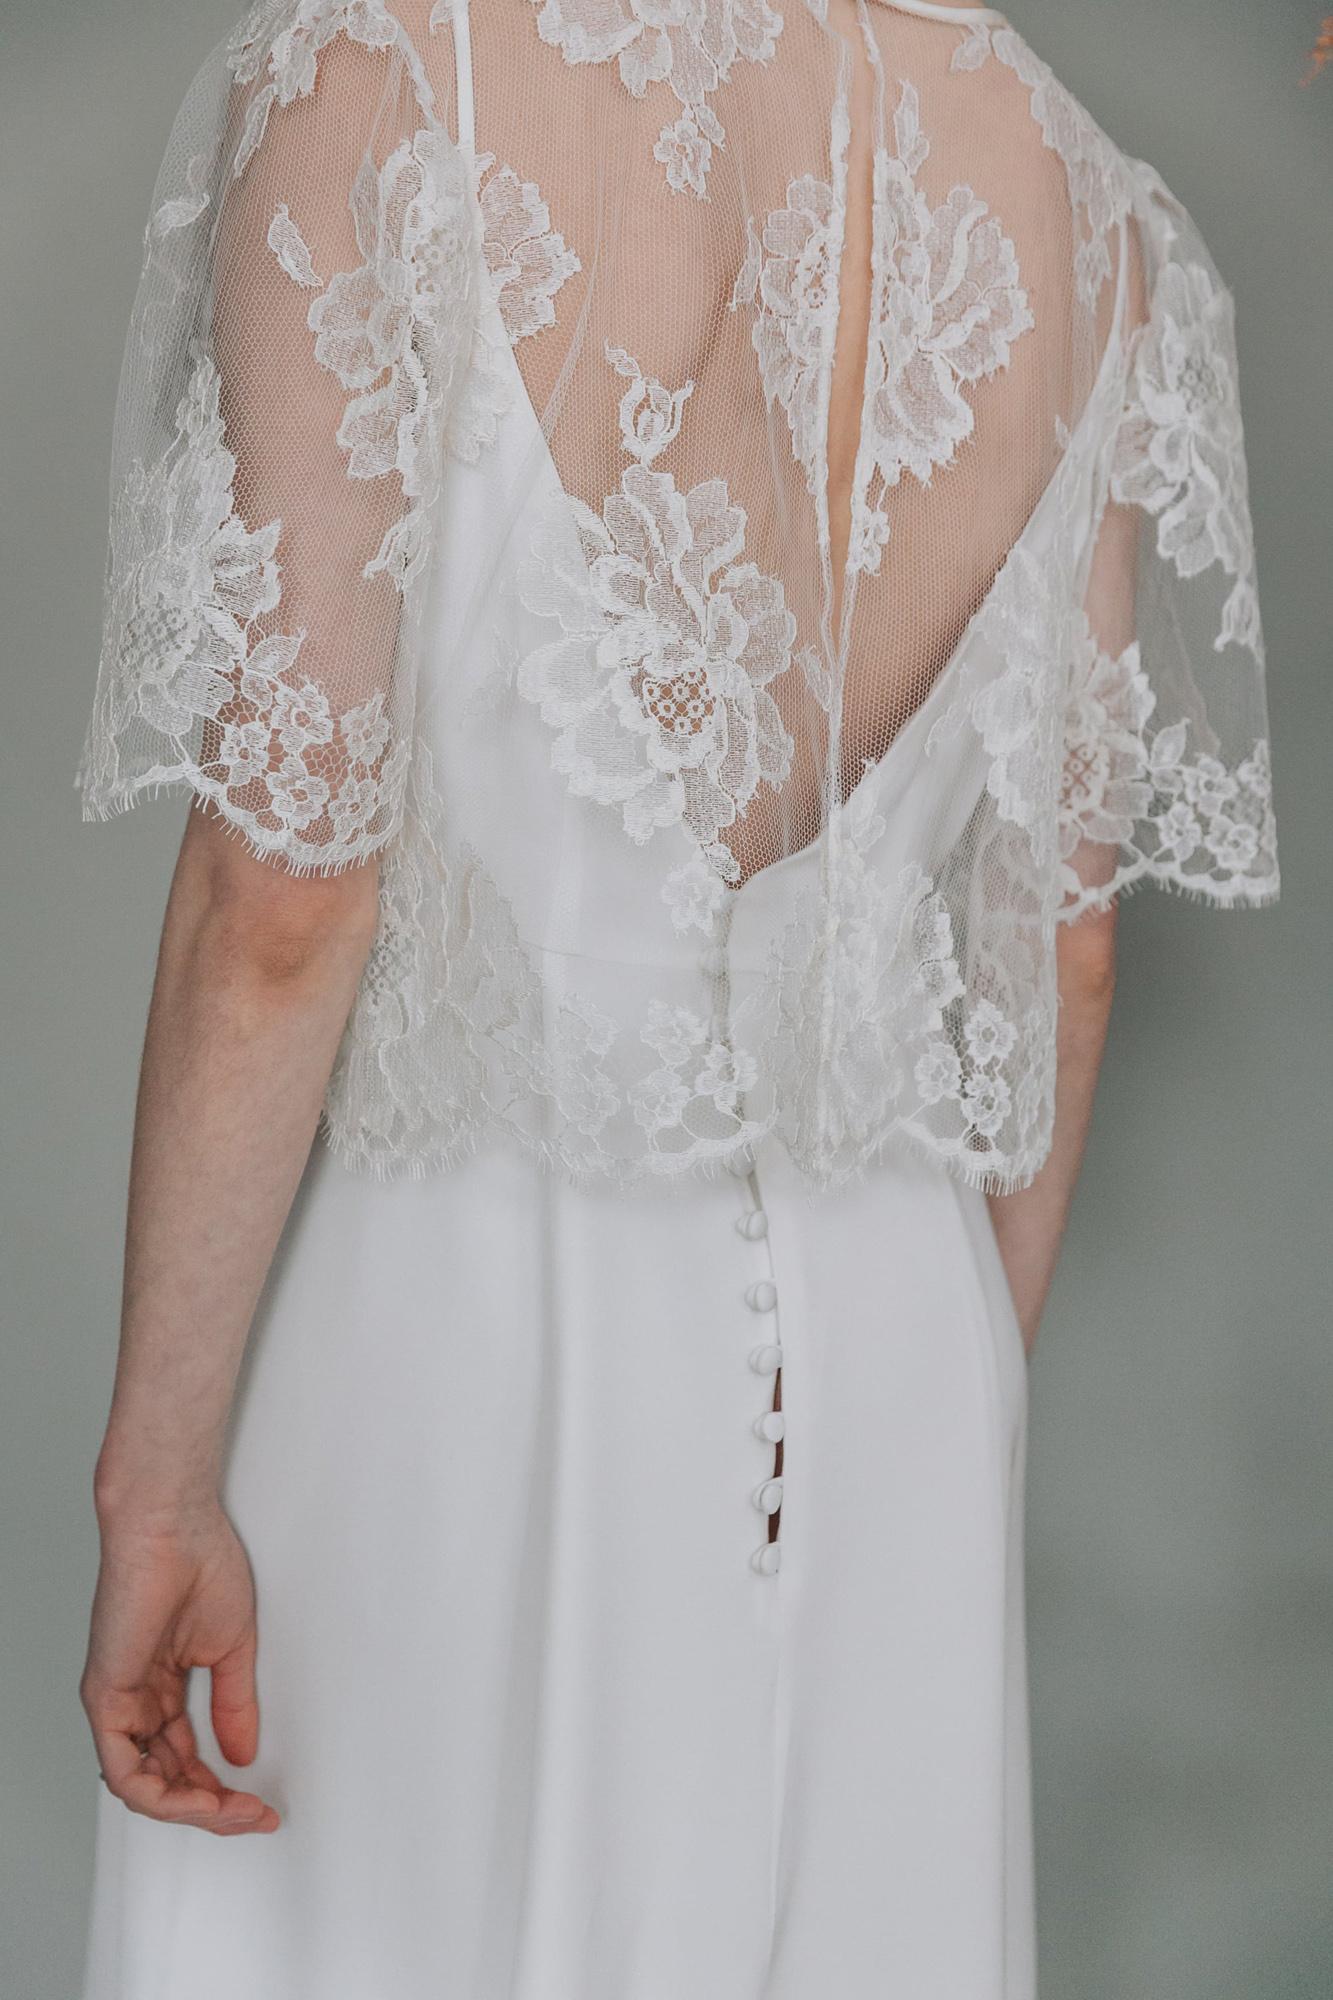 Kate-Beaumont-Sheffield-Rosa-Floral-Lace-Jacket-Snowdrop-Ivory-Matt-Silk-Modern-Wedding-Gown-4.jpg